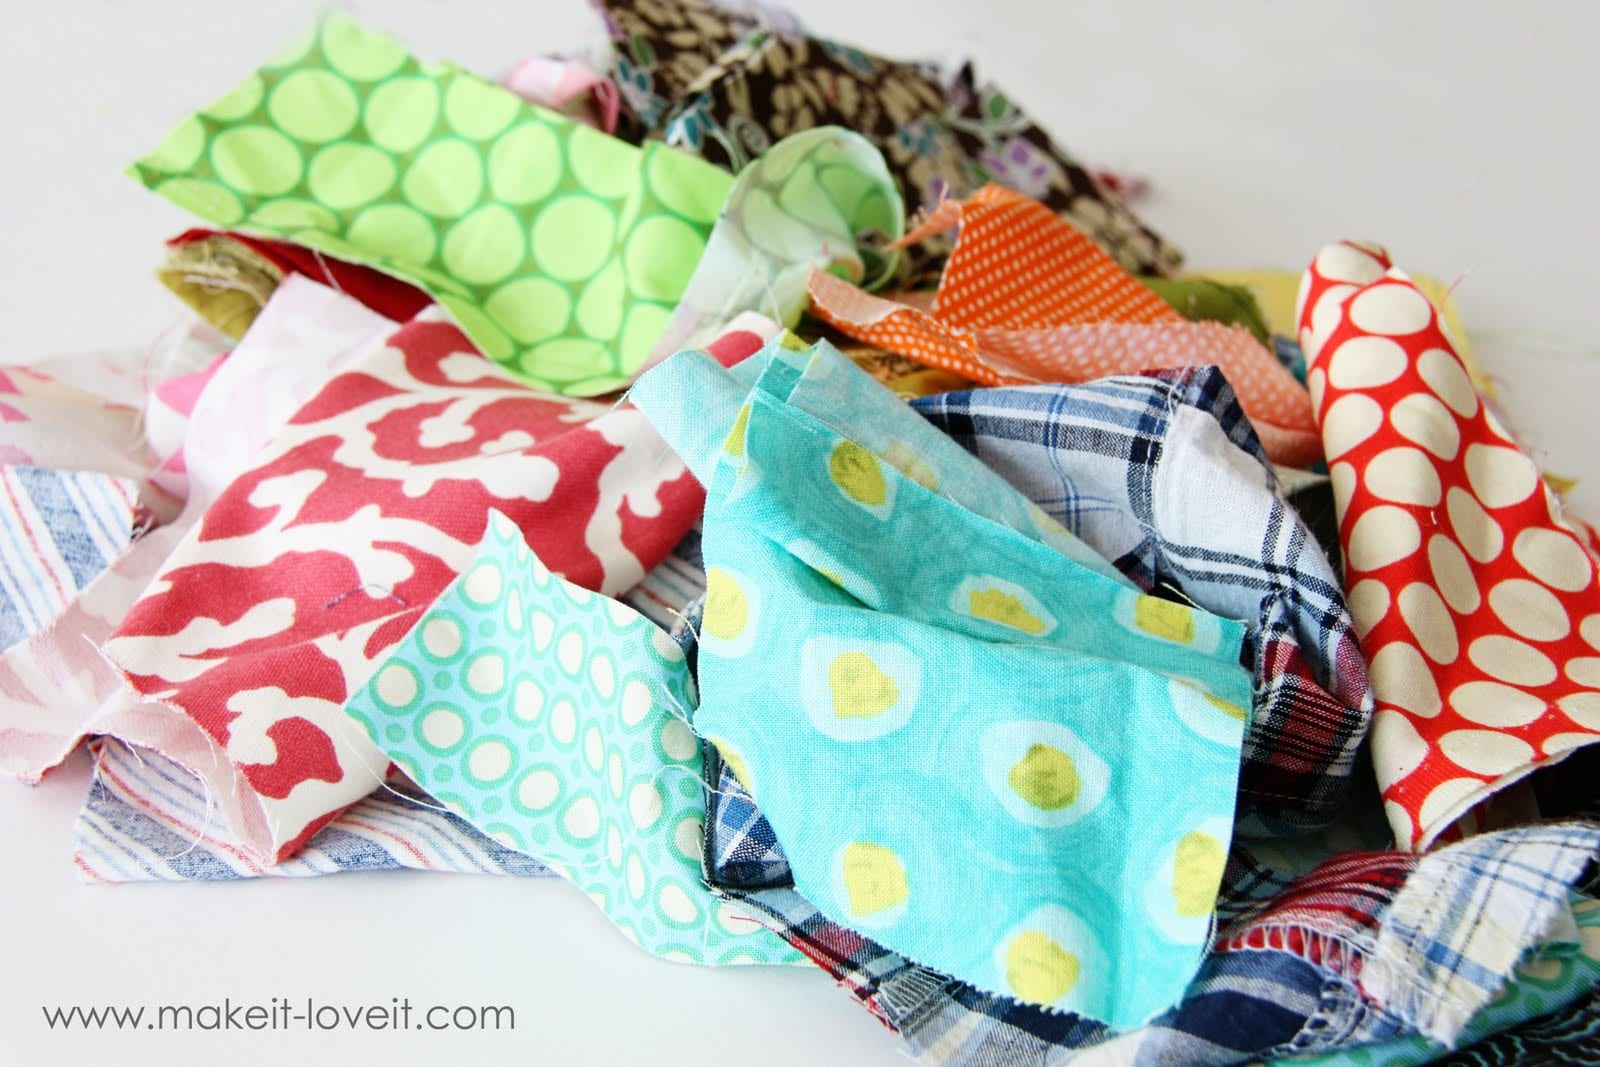 Fabric Scraps: Trash or Treasure?